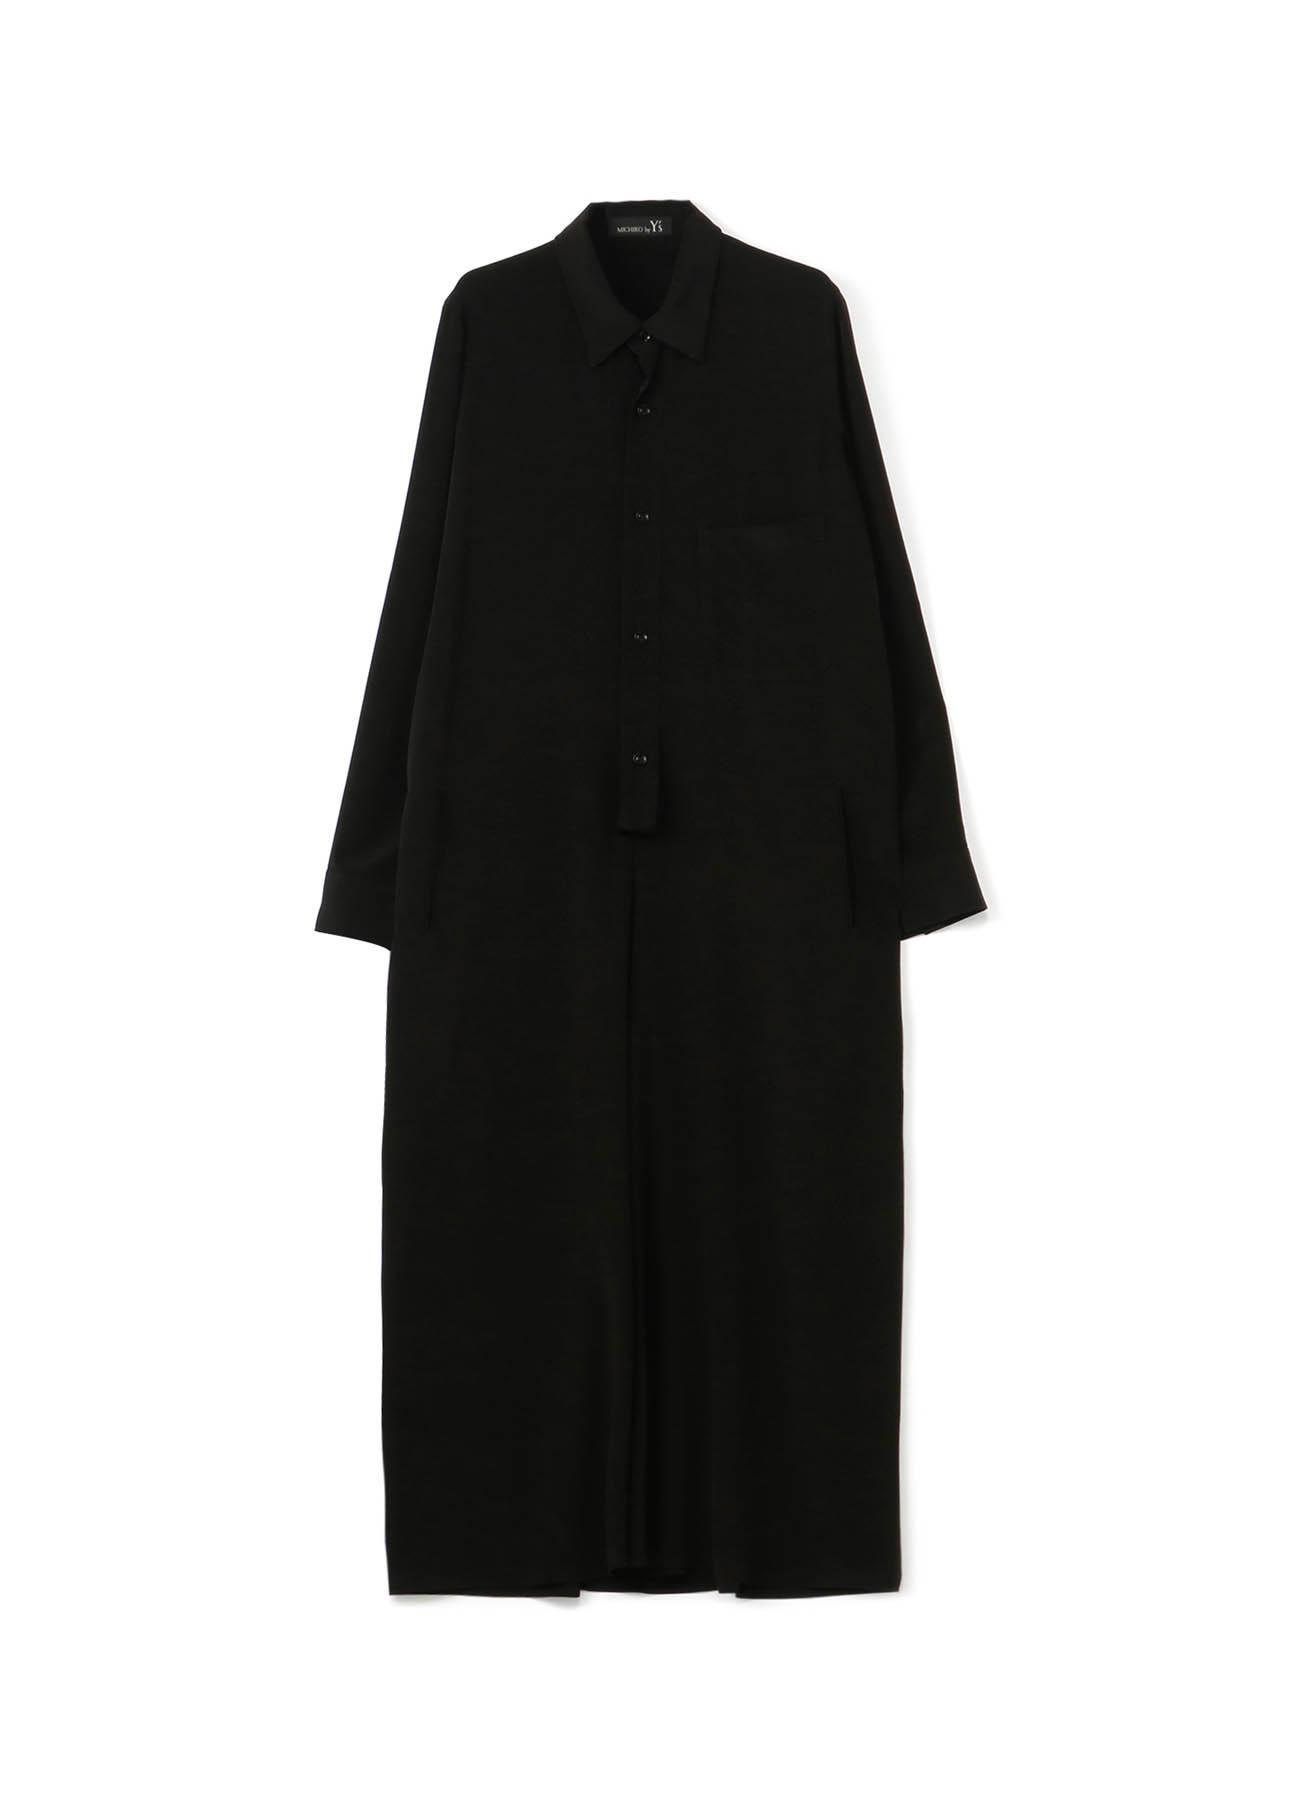 MICHIKObyY's 薄デシン ロングシャツドレス